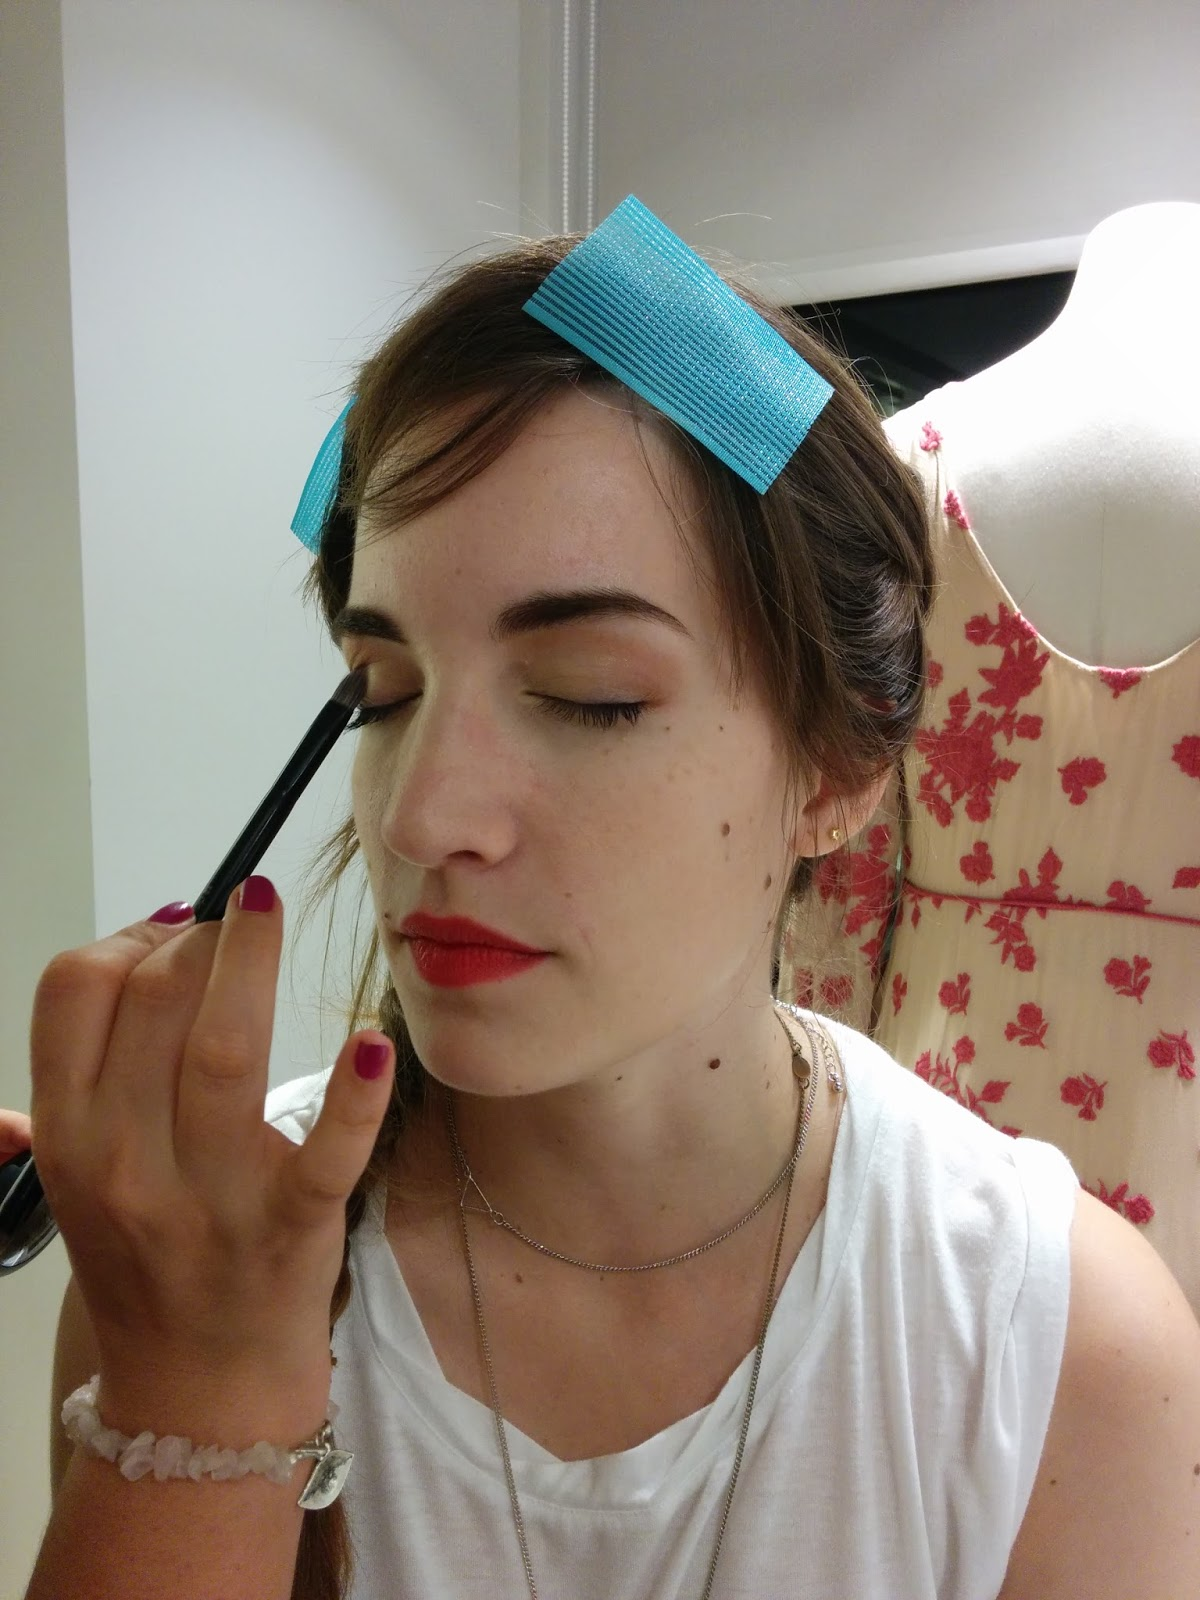 himynameisjudit maquillada por potisdecolores